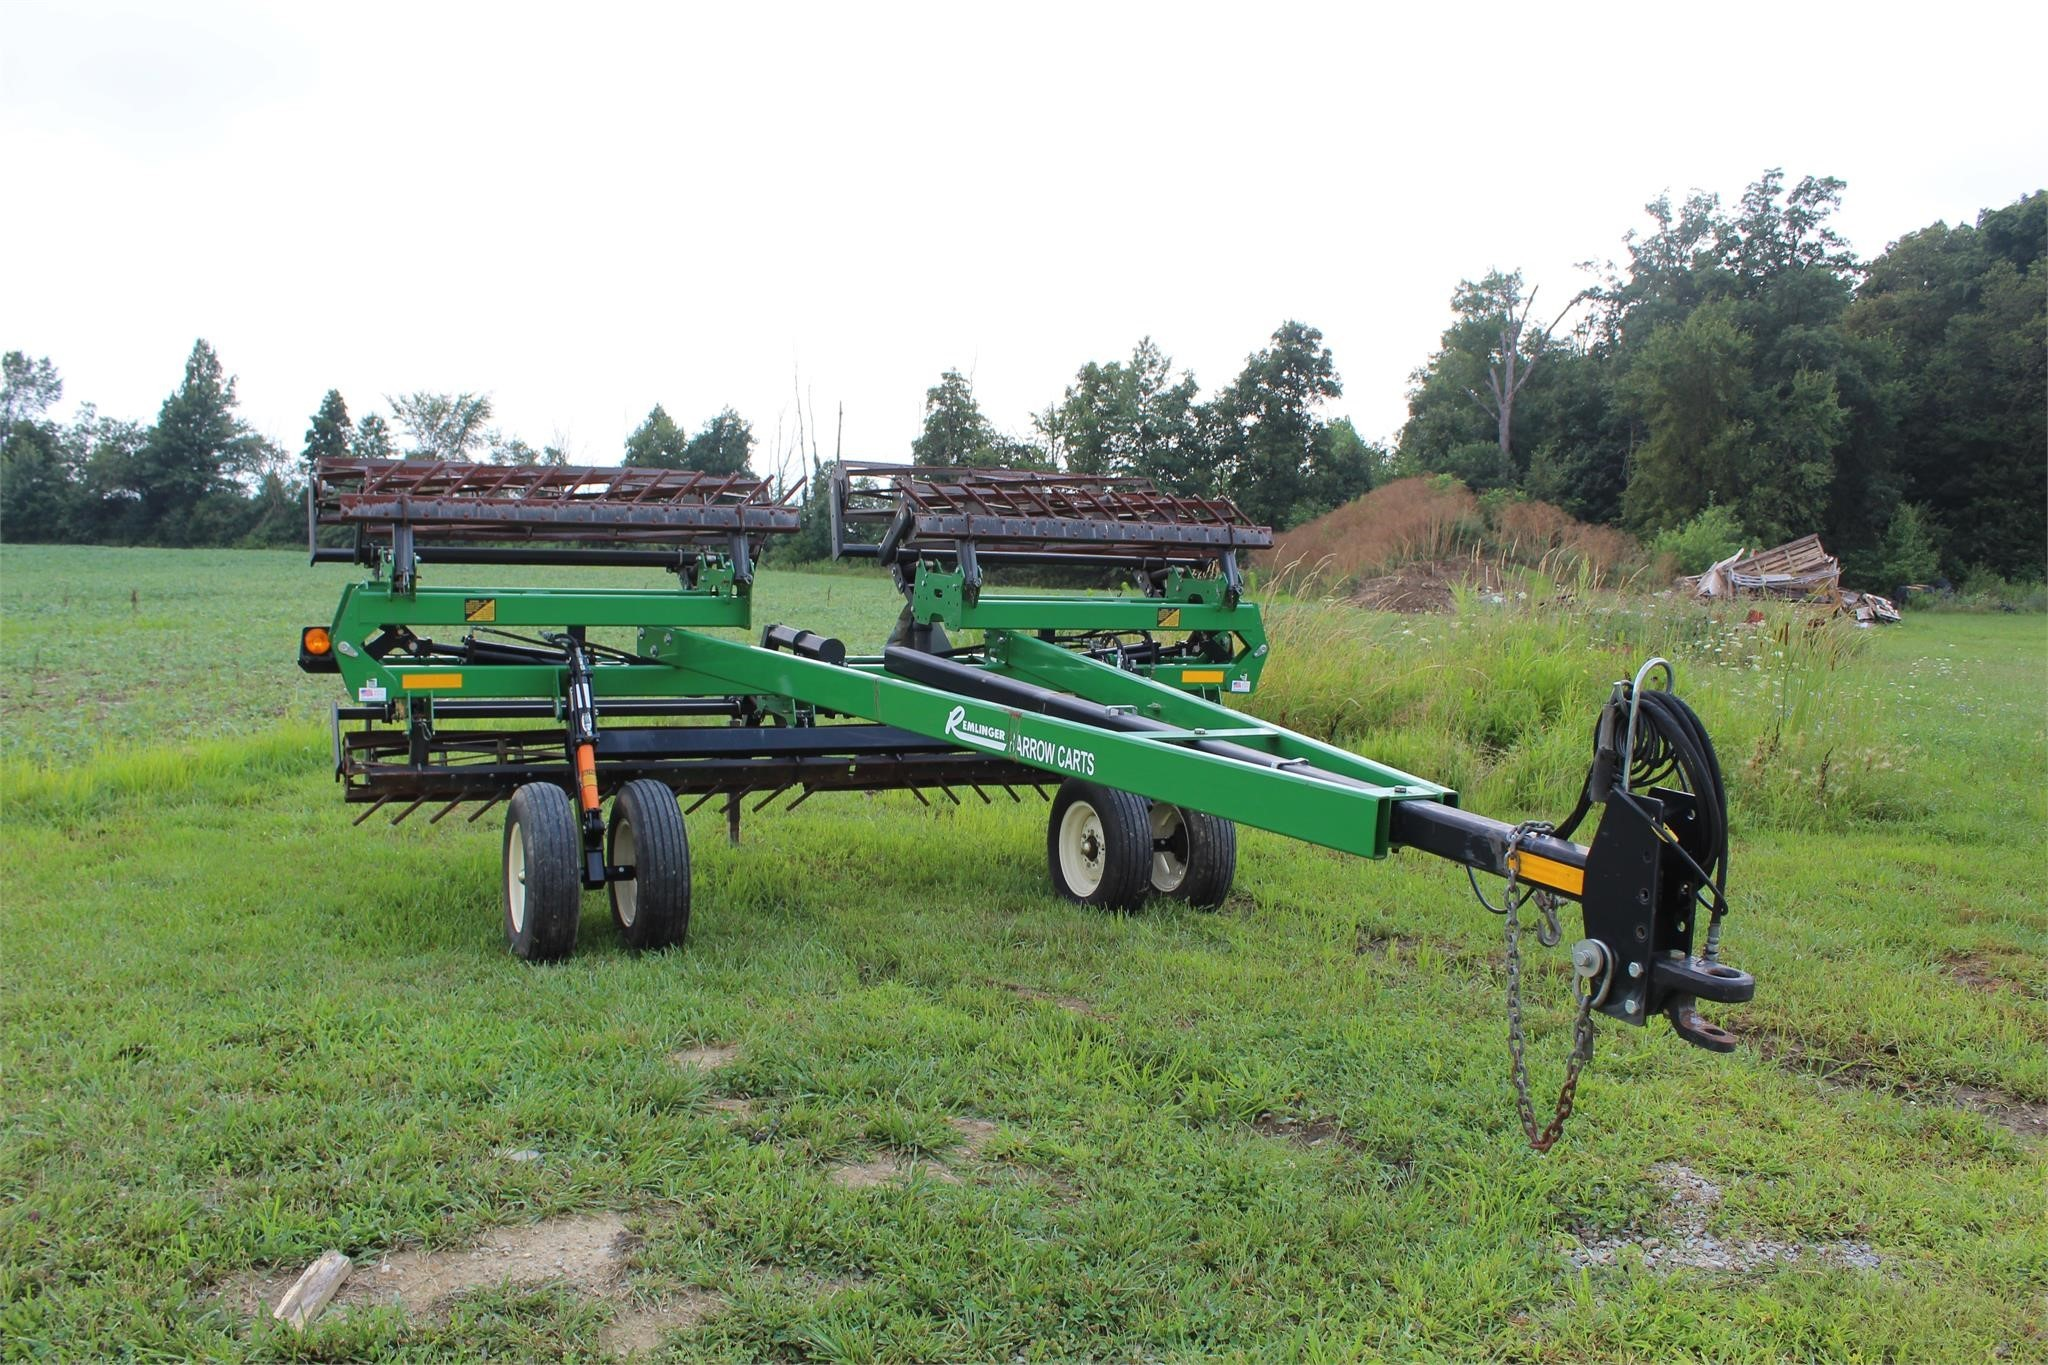 2012 Remlinger DRH-26.5 Harrow